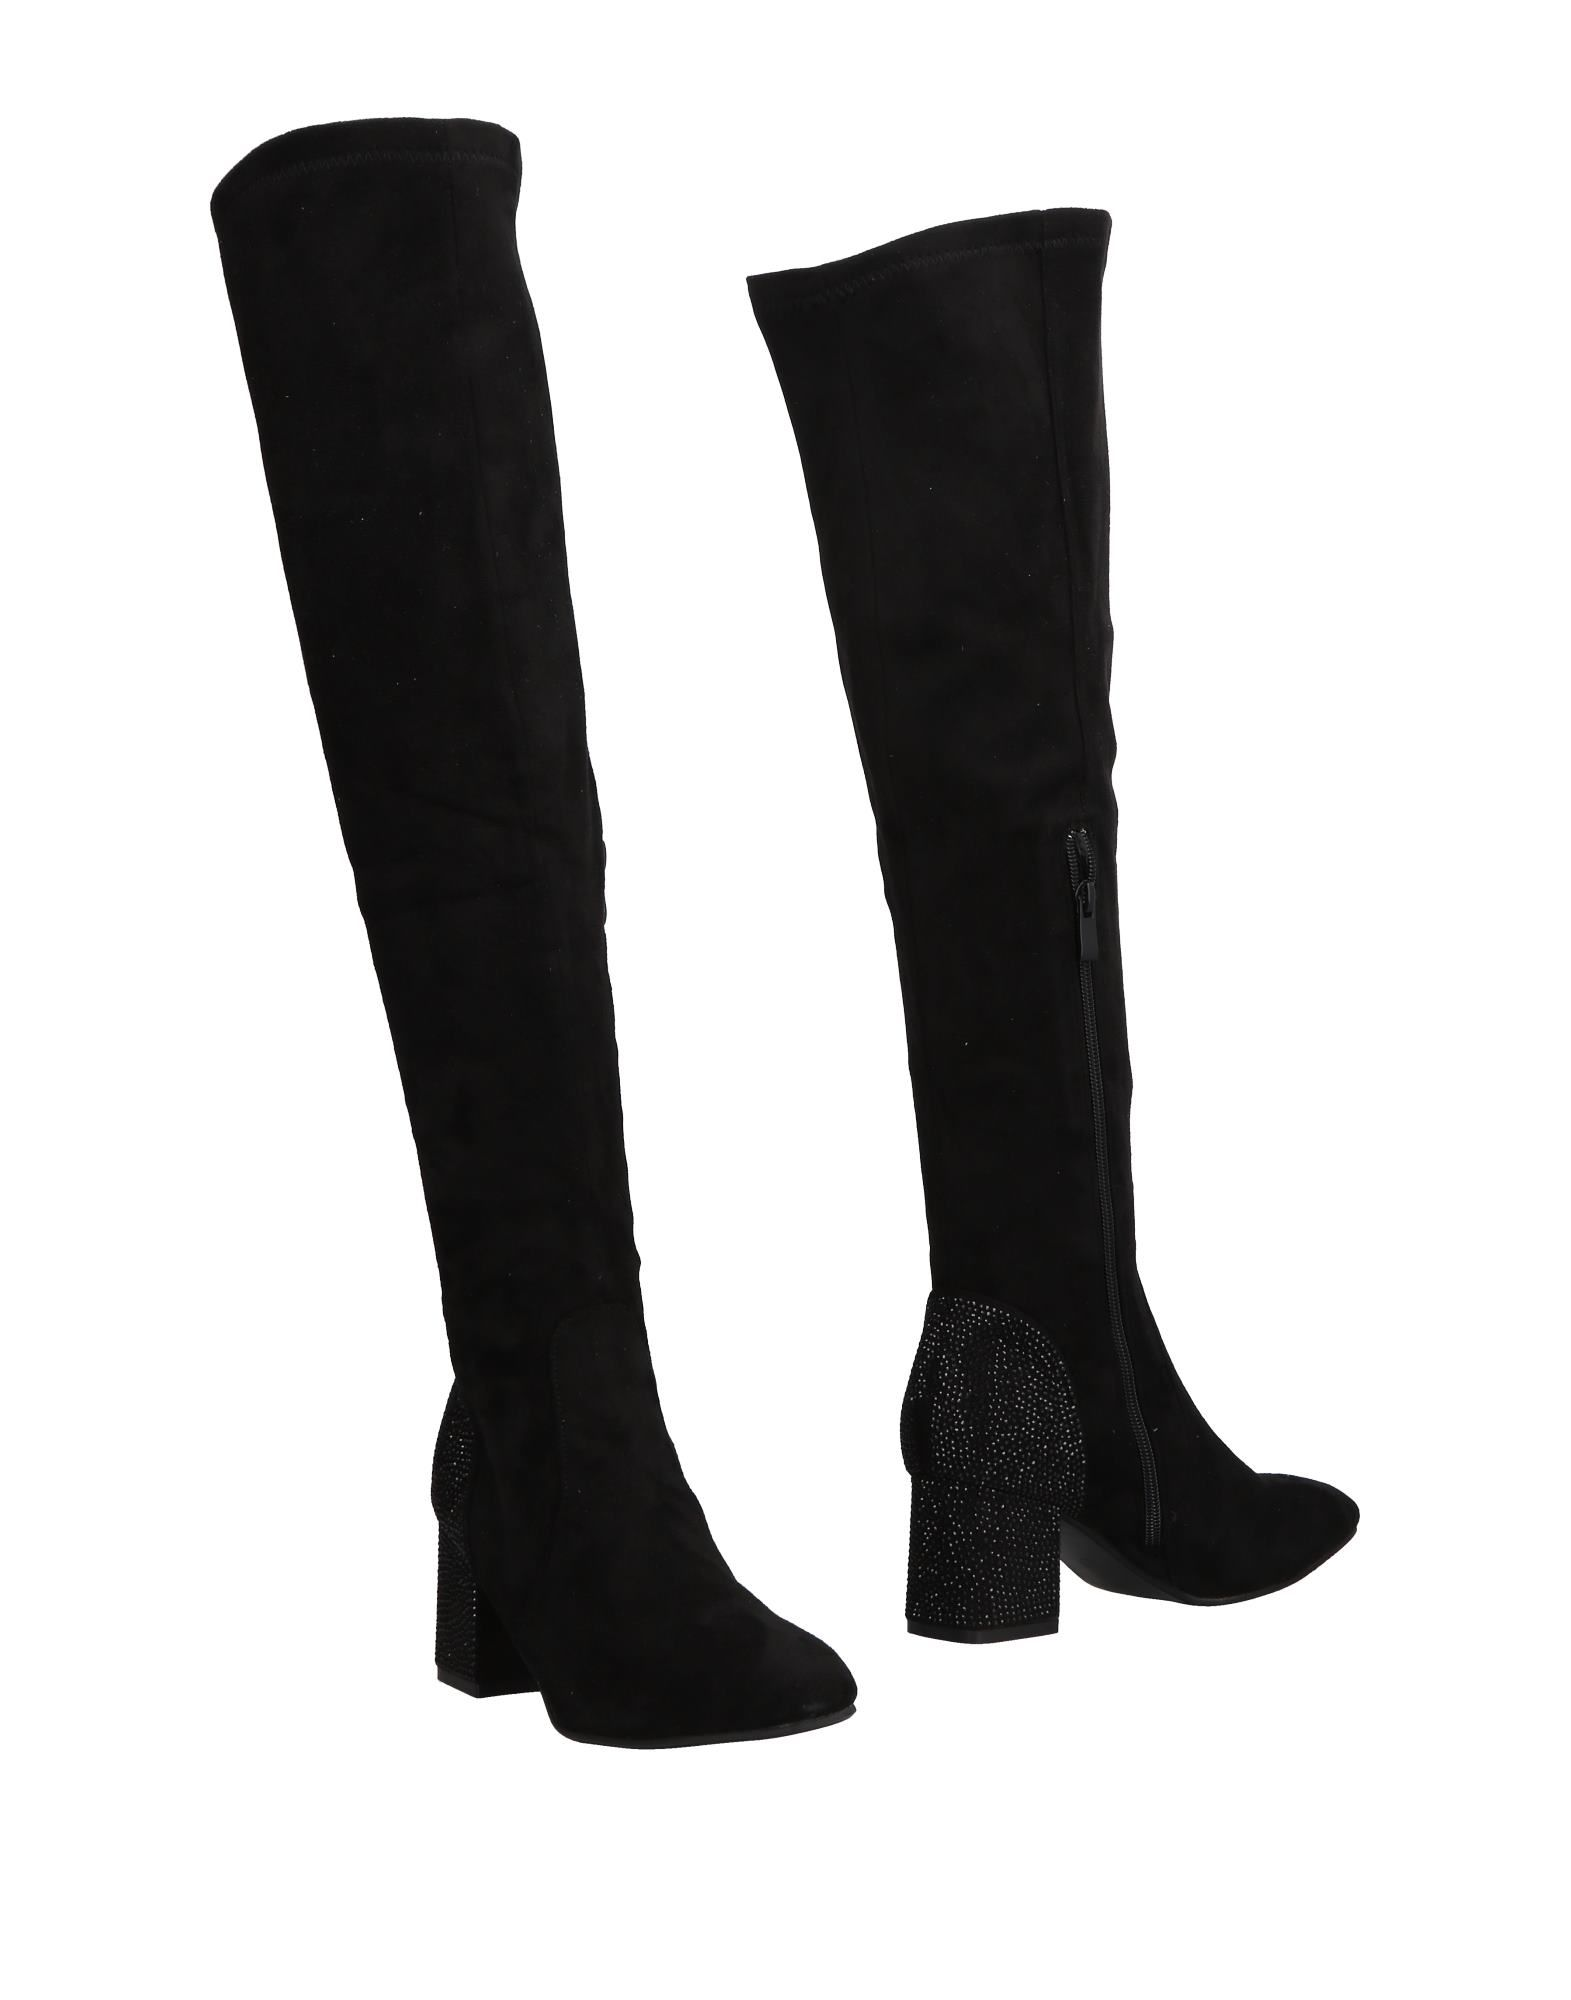 Gut Mallas um billige Schuhe zu tragenExé By Tsakiris Mallas Gut Stiefel Damen  11506362OM 6b9982